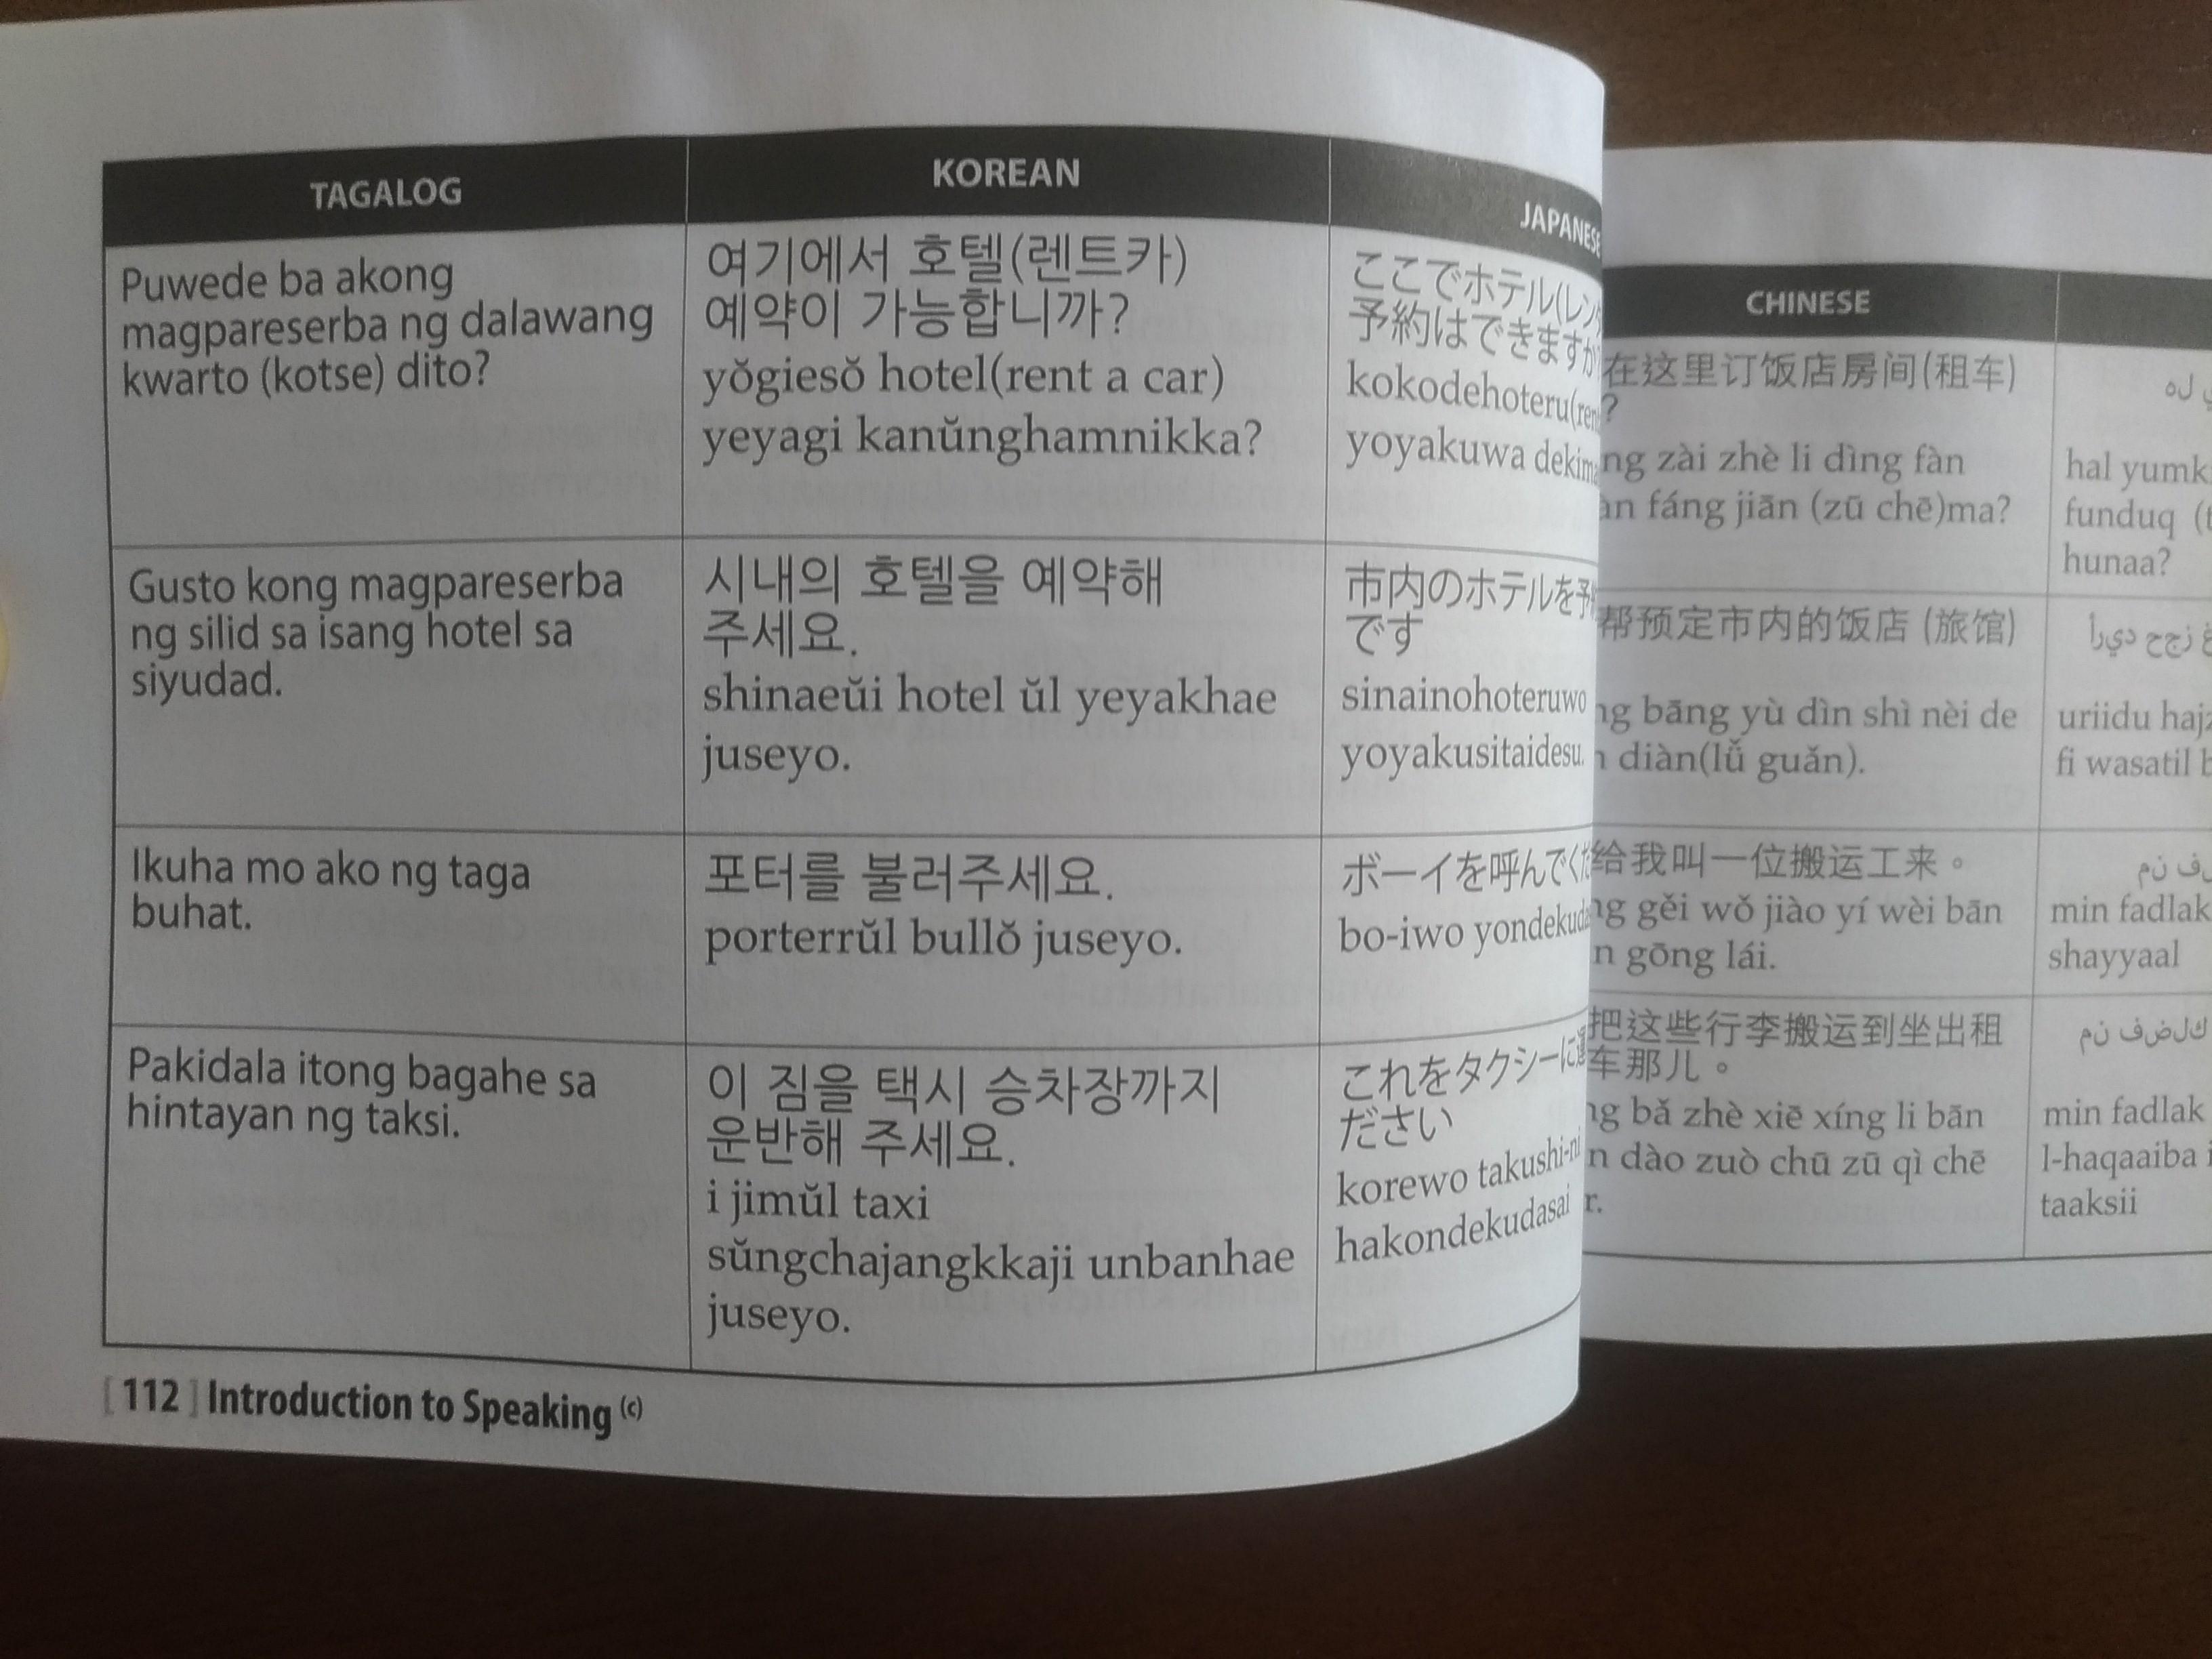 Introduction  to  Speaking 6 Languages Filipino / Japanese / Korean / Chinese / Arabic / English